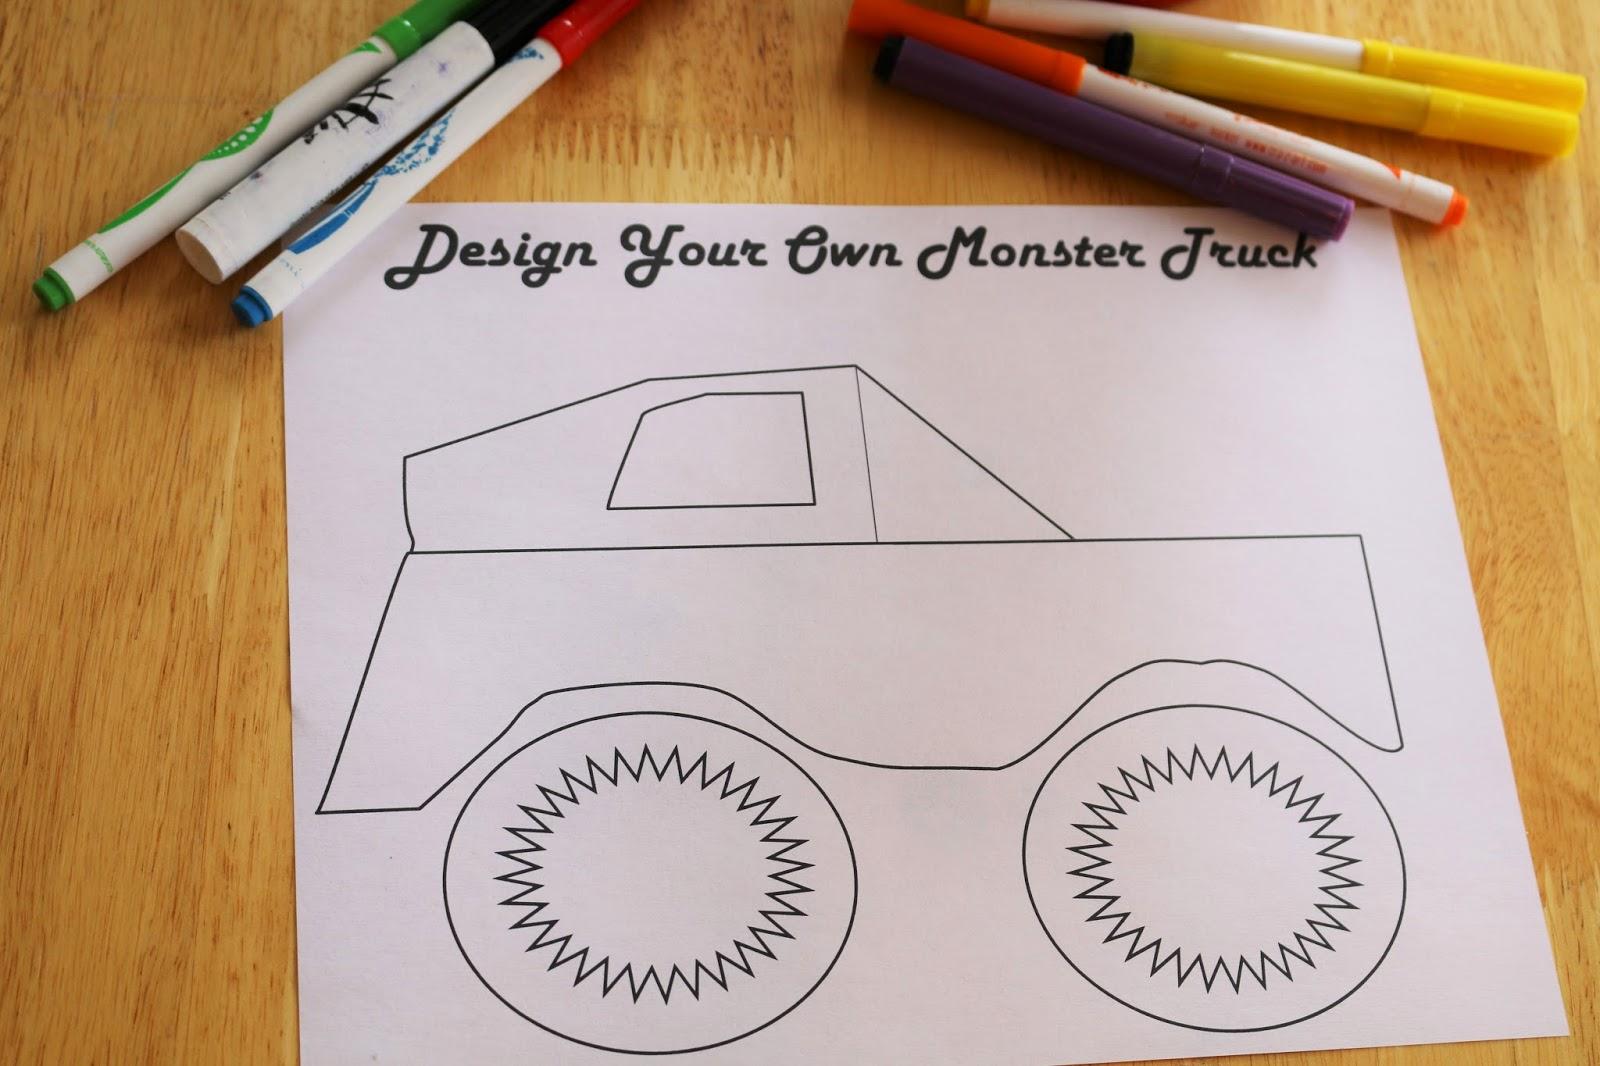 Design Your Own Monster Truck Printable